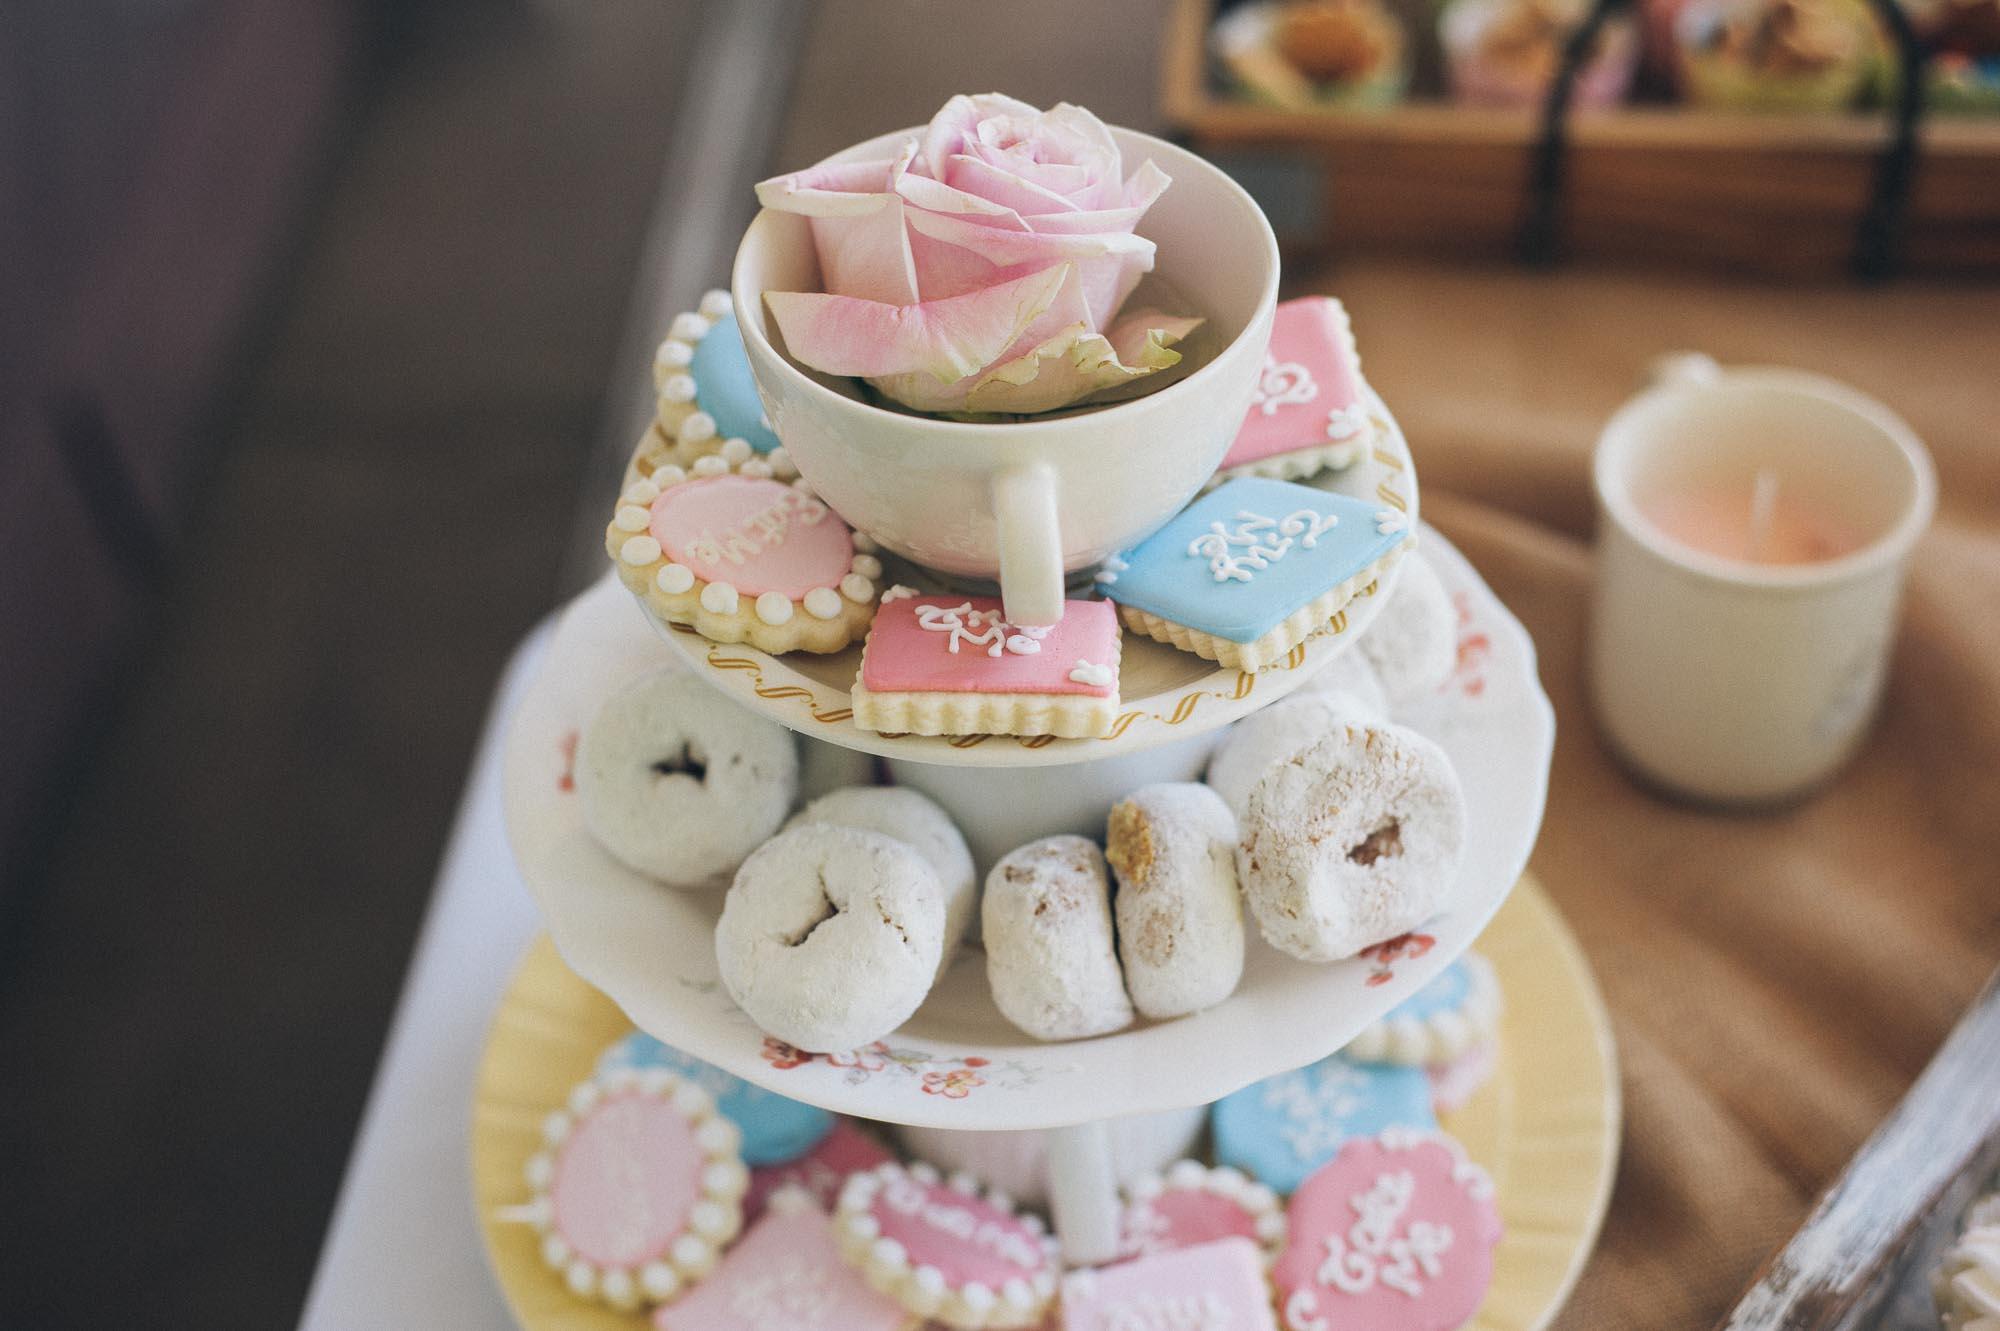 m.newsom-photography-one-year-old-girls-birthday-party-ideas-alice-in-wonderland (15 of 42).jpg